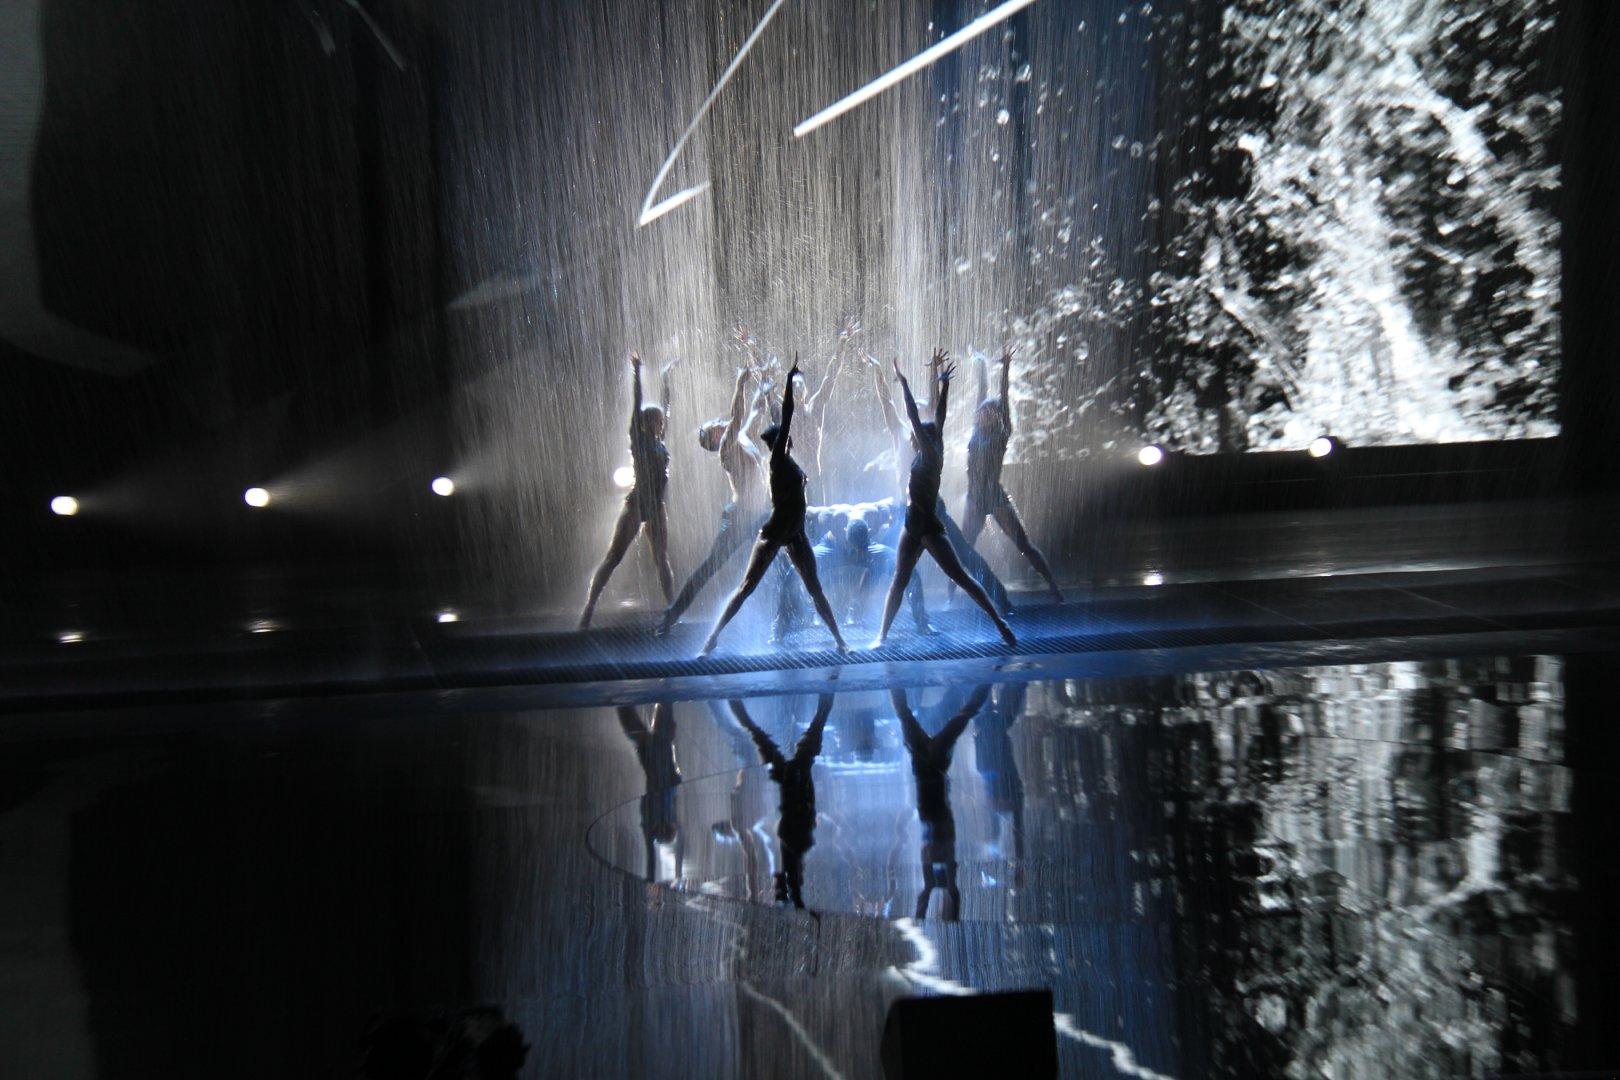 Балетът ще изнесе представление на 17-и декември в Бургас